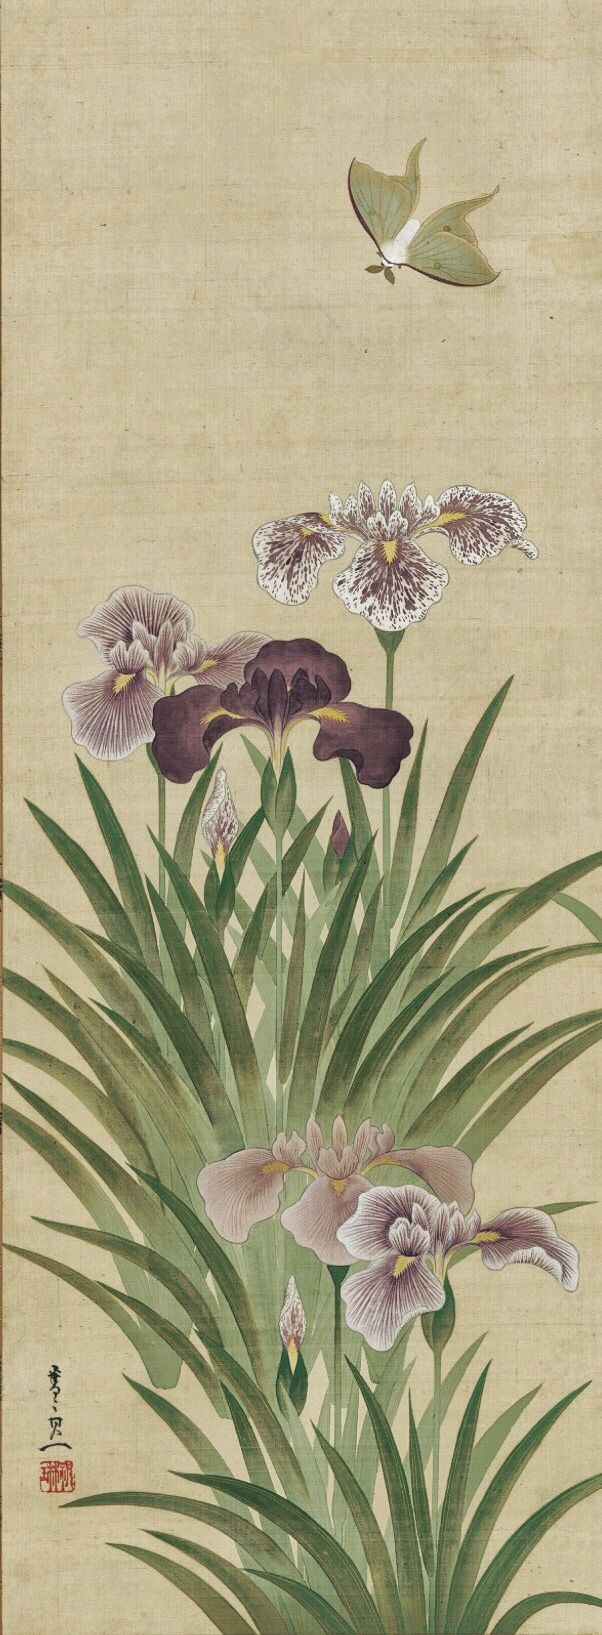 Suzuki Kiitsu | Irises and Moth (cropped). Edo period (1615–1868) | nineteenth century. Japanese hanging scroll. The Met